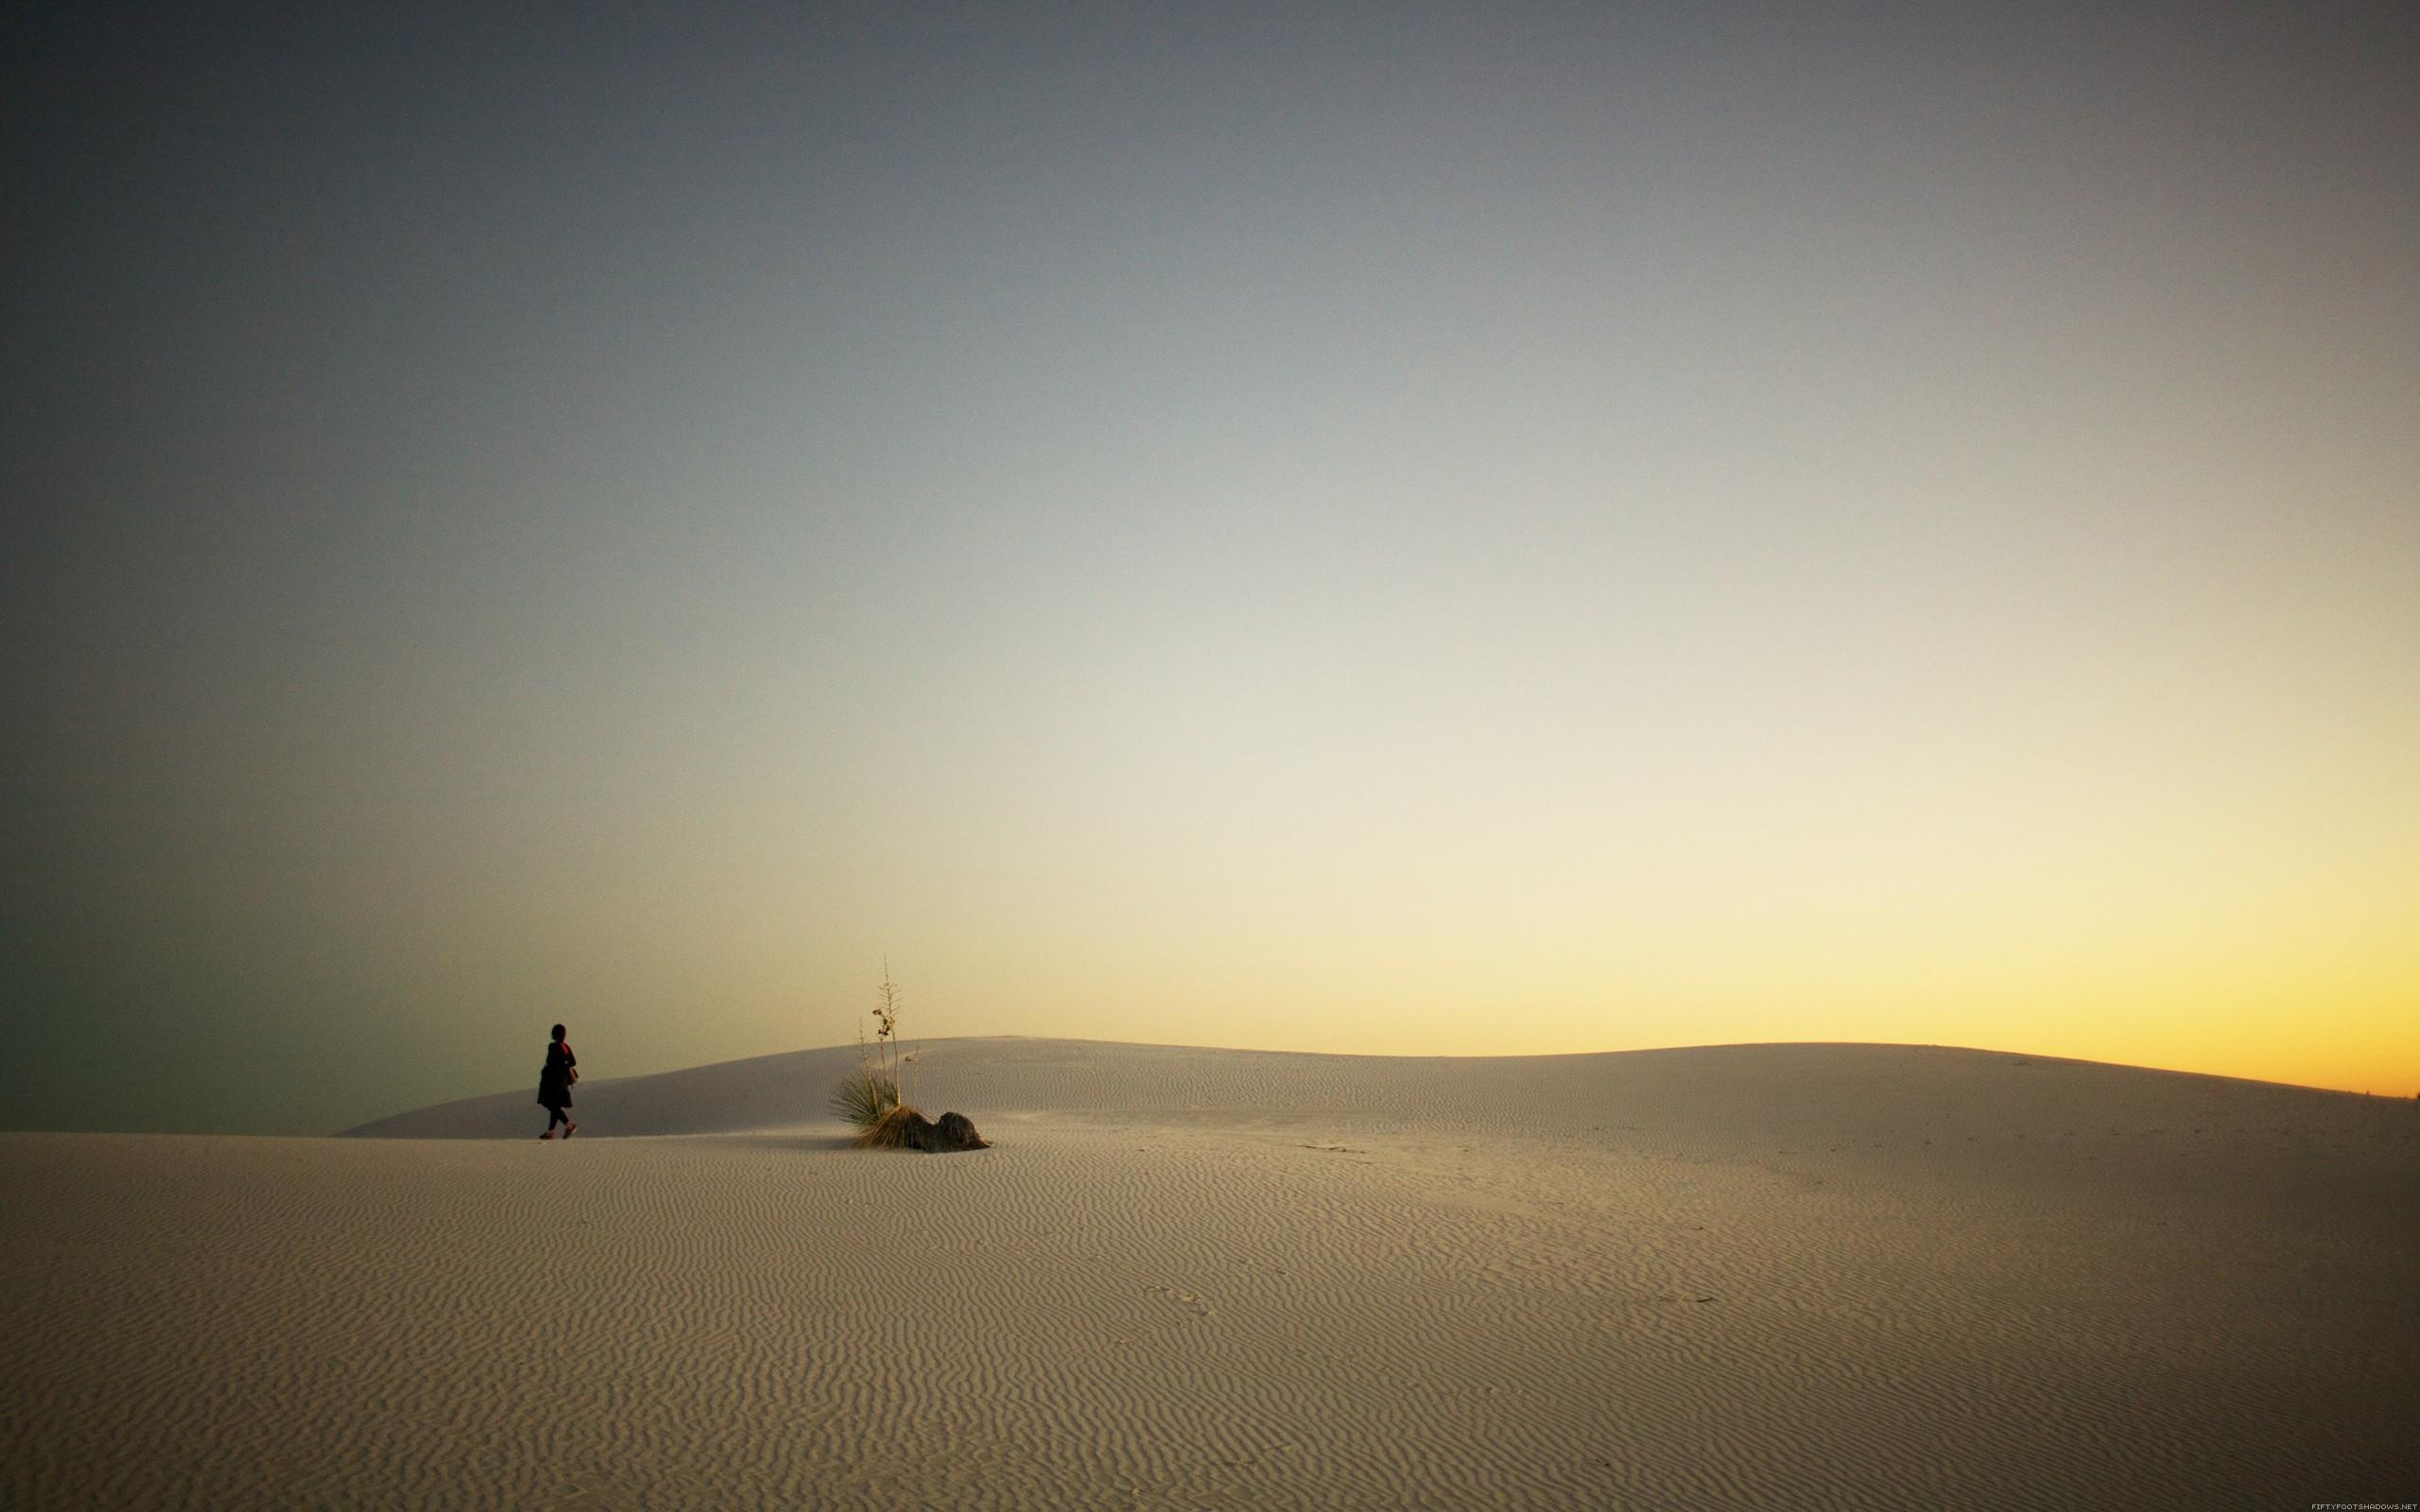 Sand desert lost (tv series) wallpaper   2560x1600   12257 ...